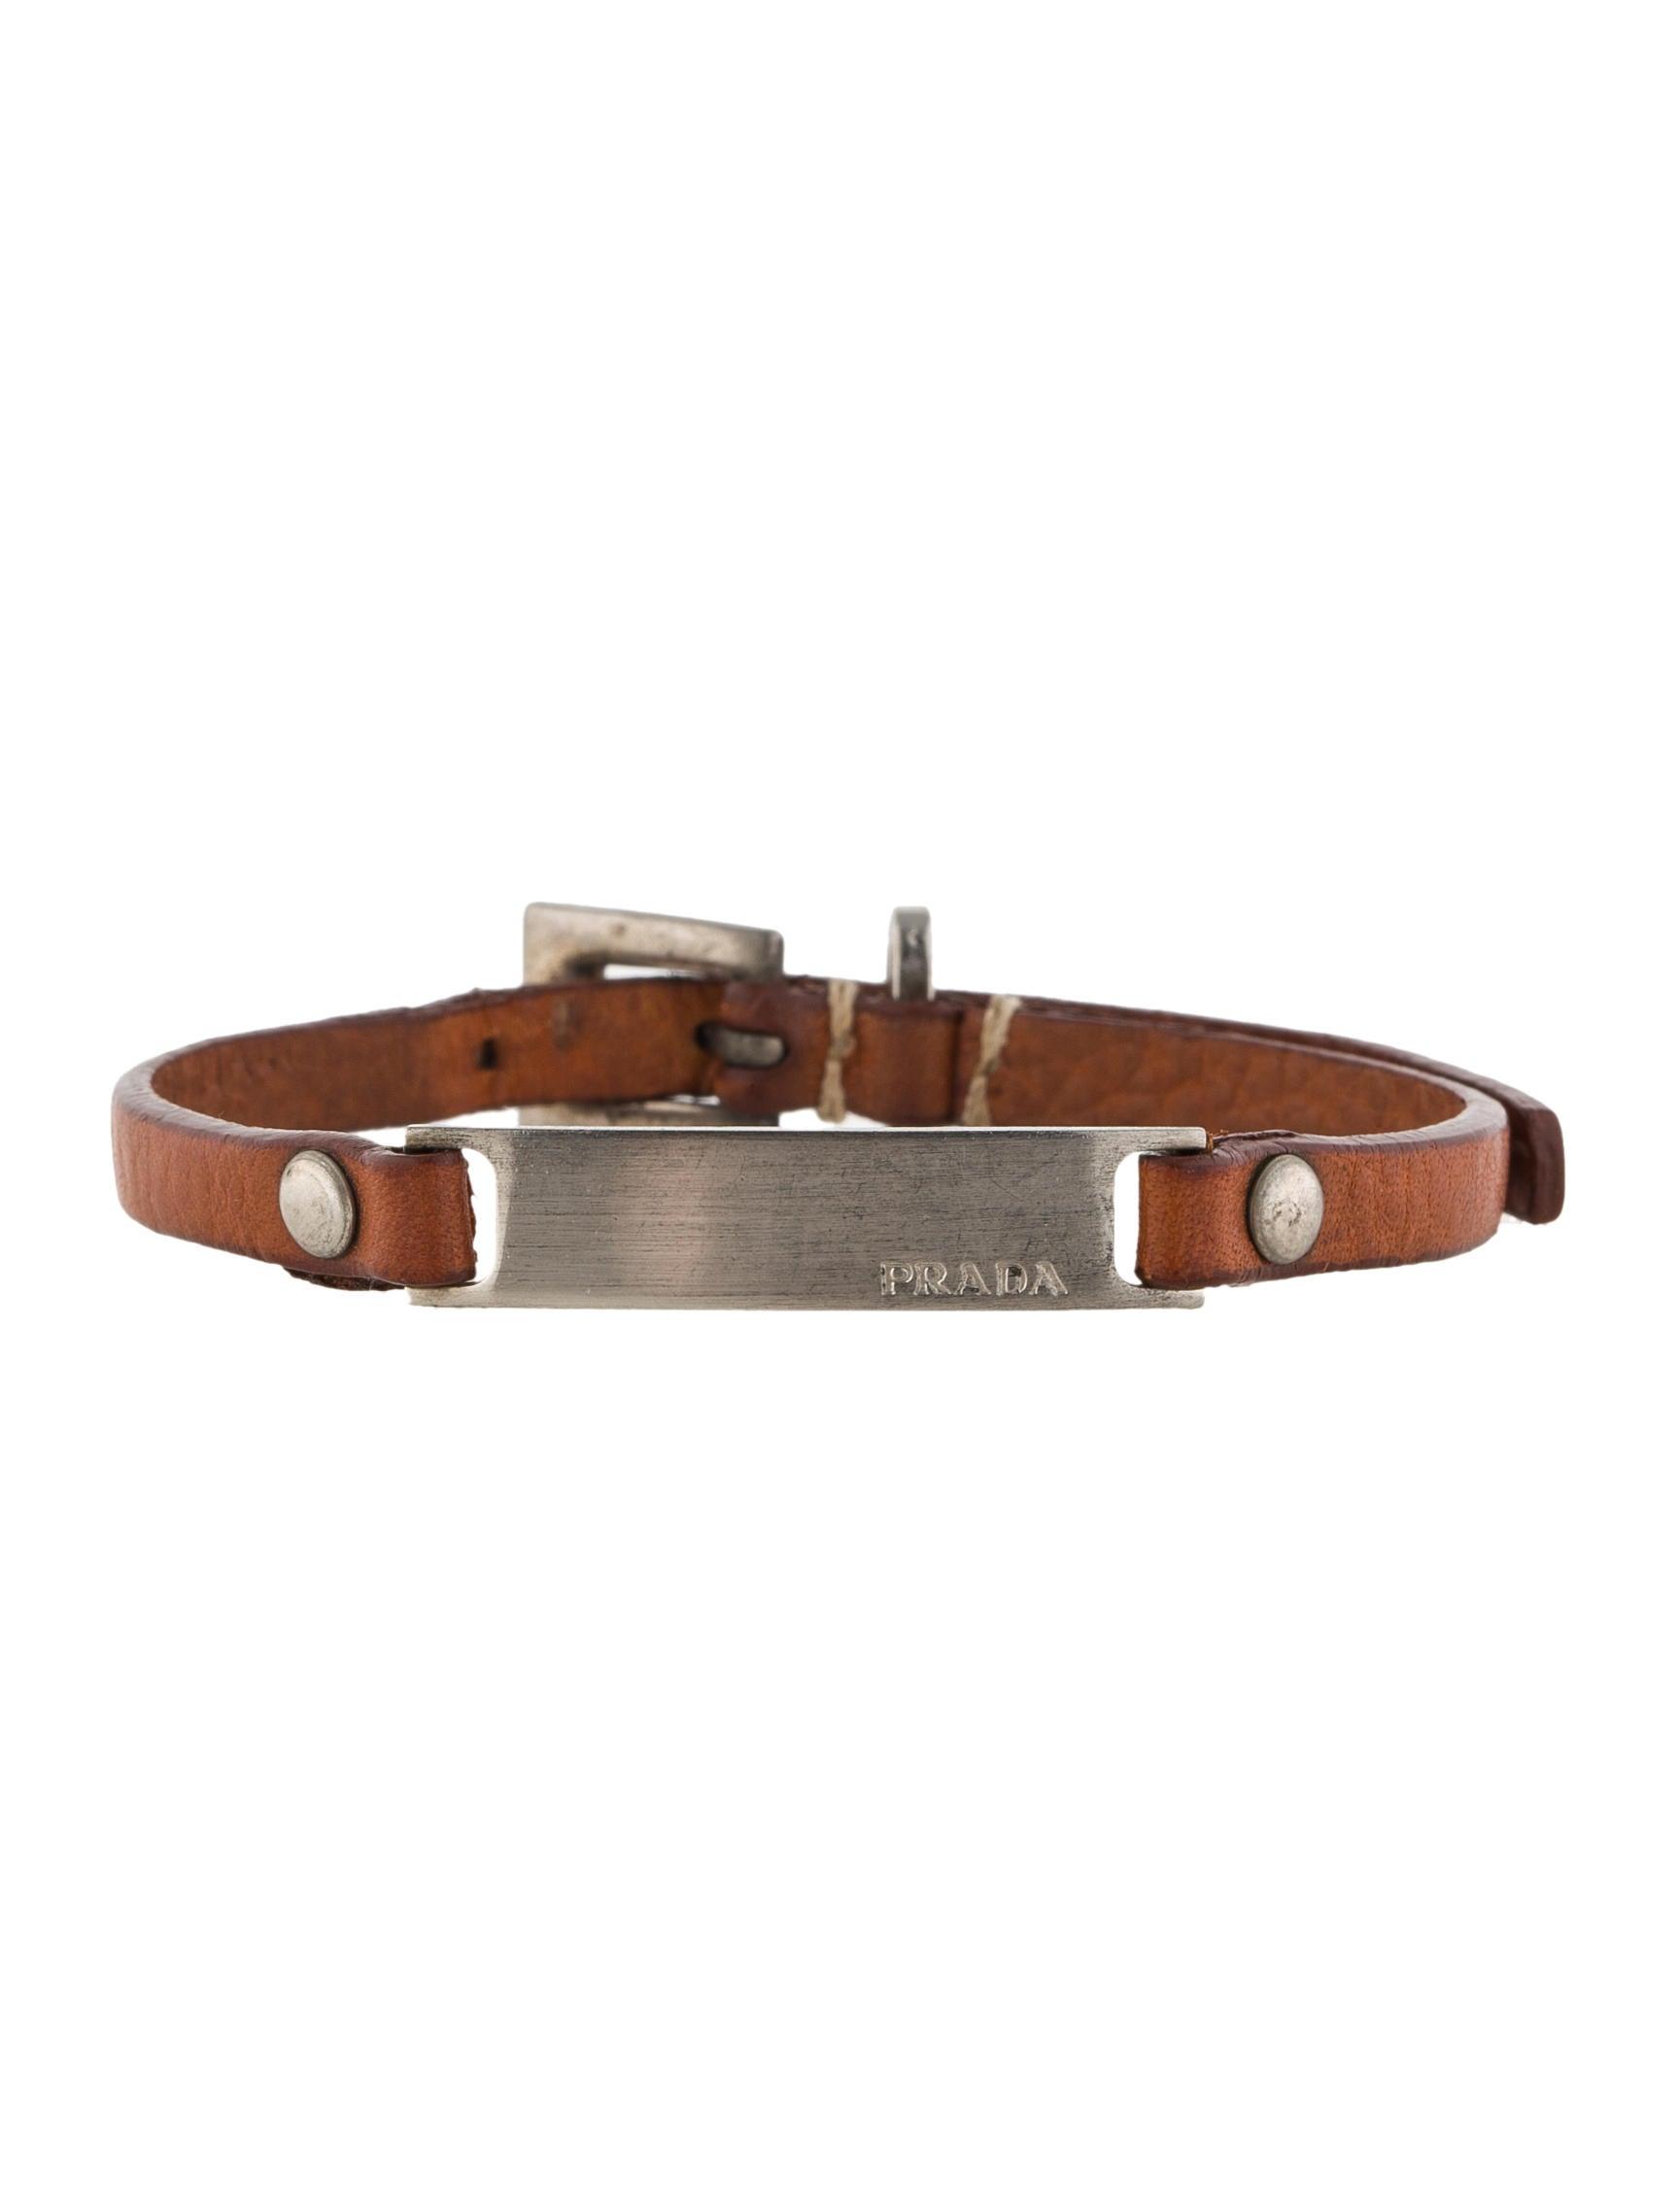 baby pink chanel purse - Prada Leather Bracelet - Jewelry - PRA40439 | The RealReal